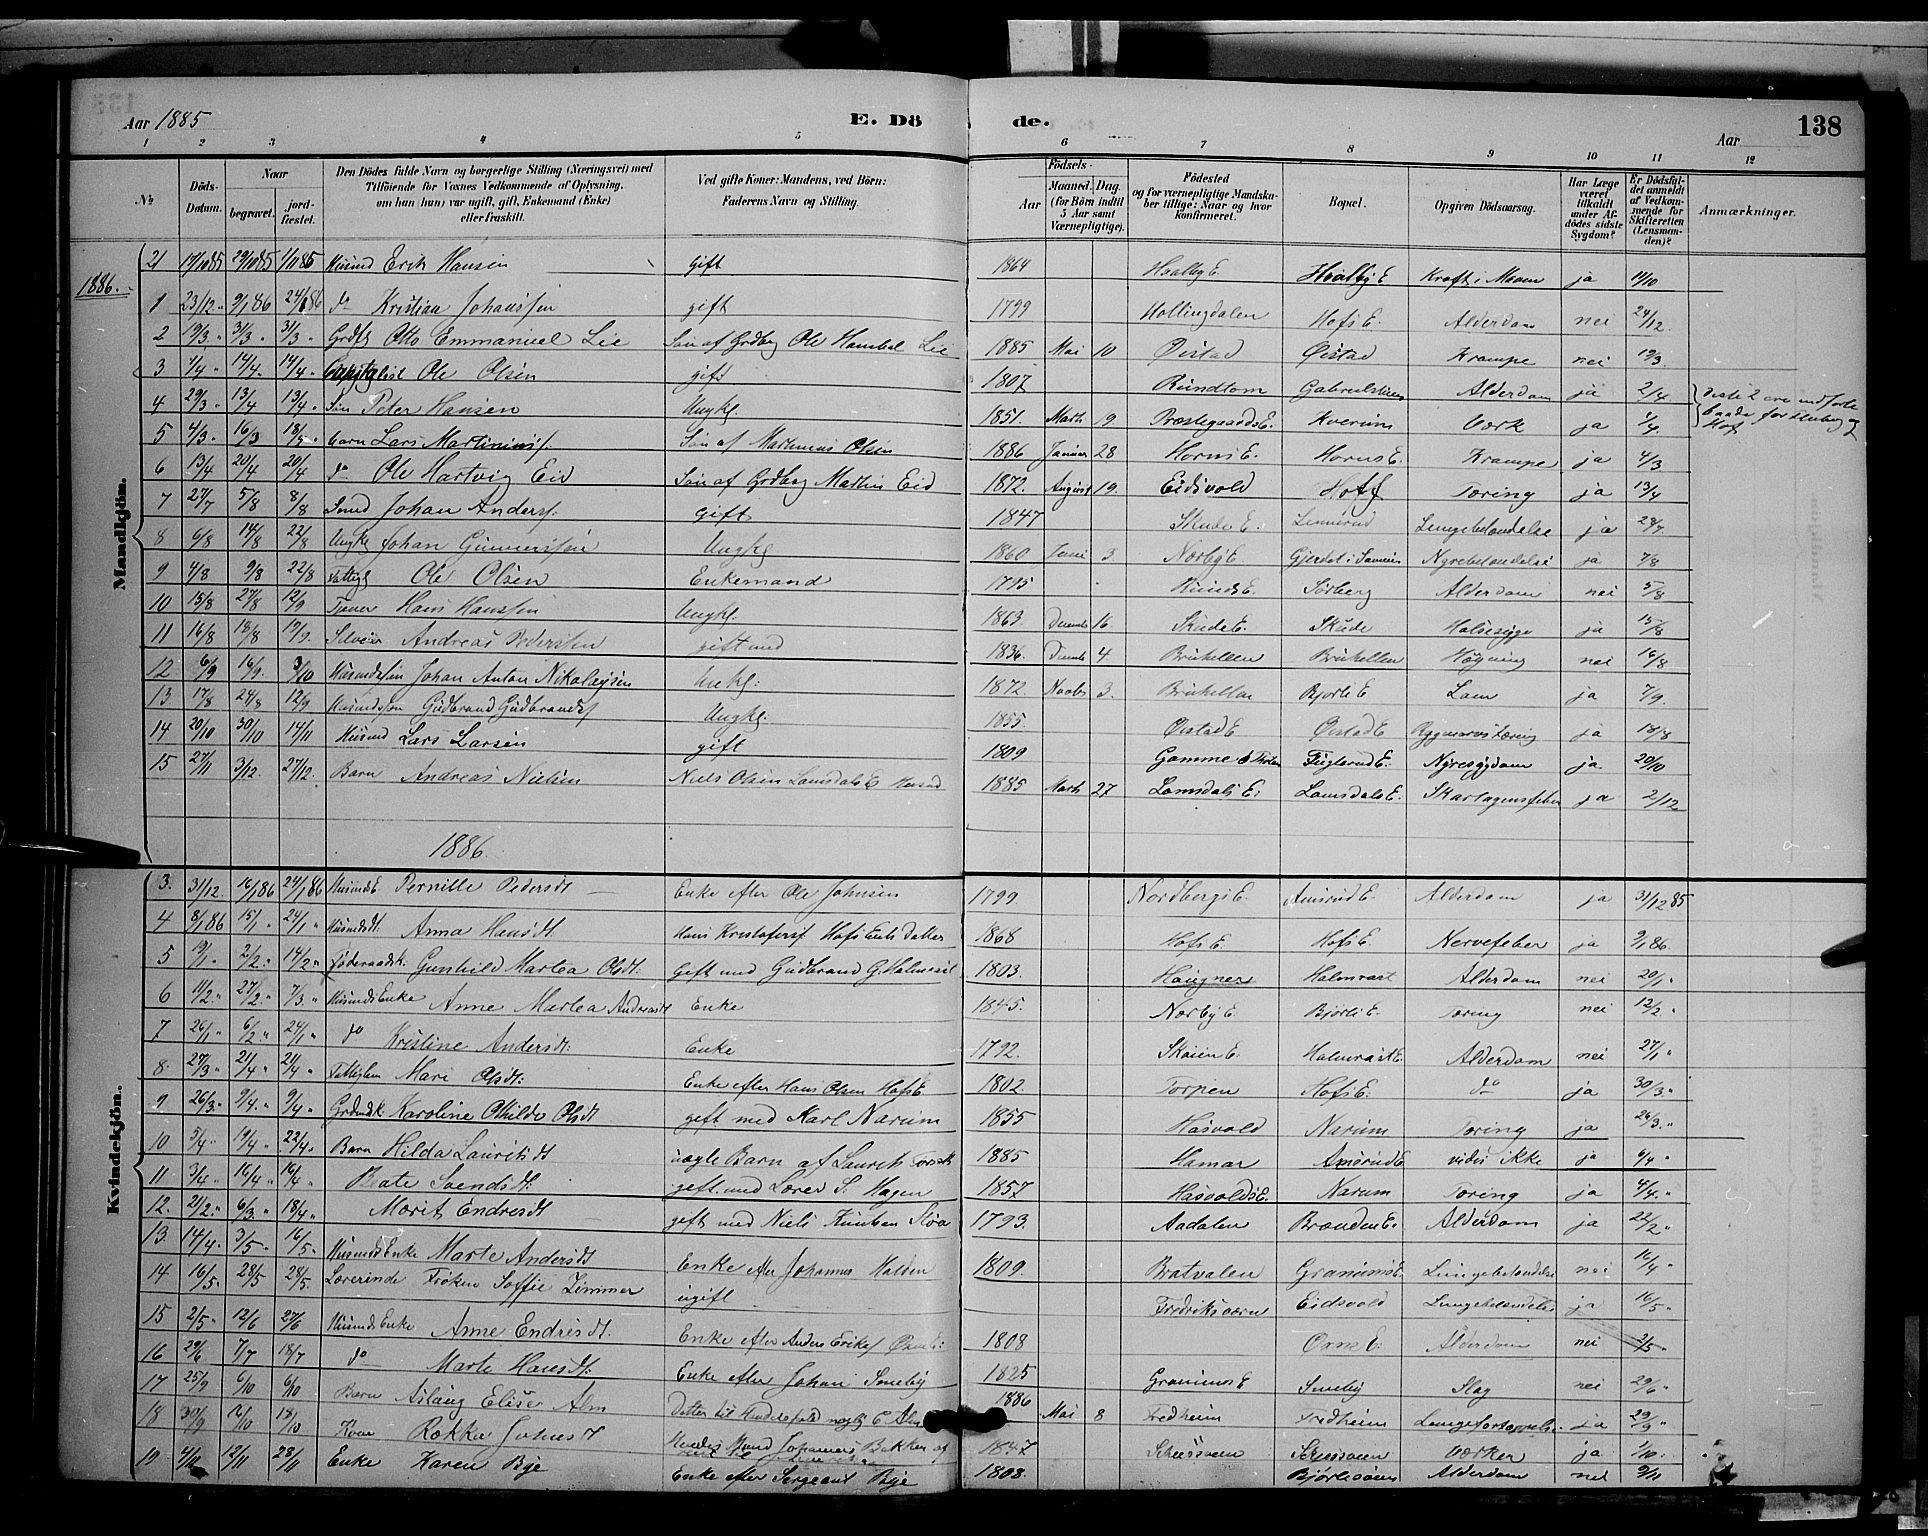 SAH, Søndre Land prestekontor, L/L0002: Klokkerbok nr. 2, 1884-1900, s. 138